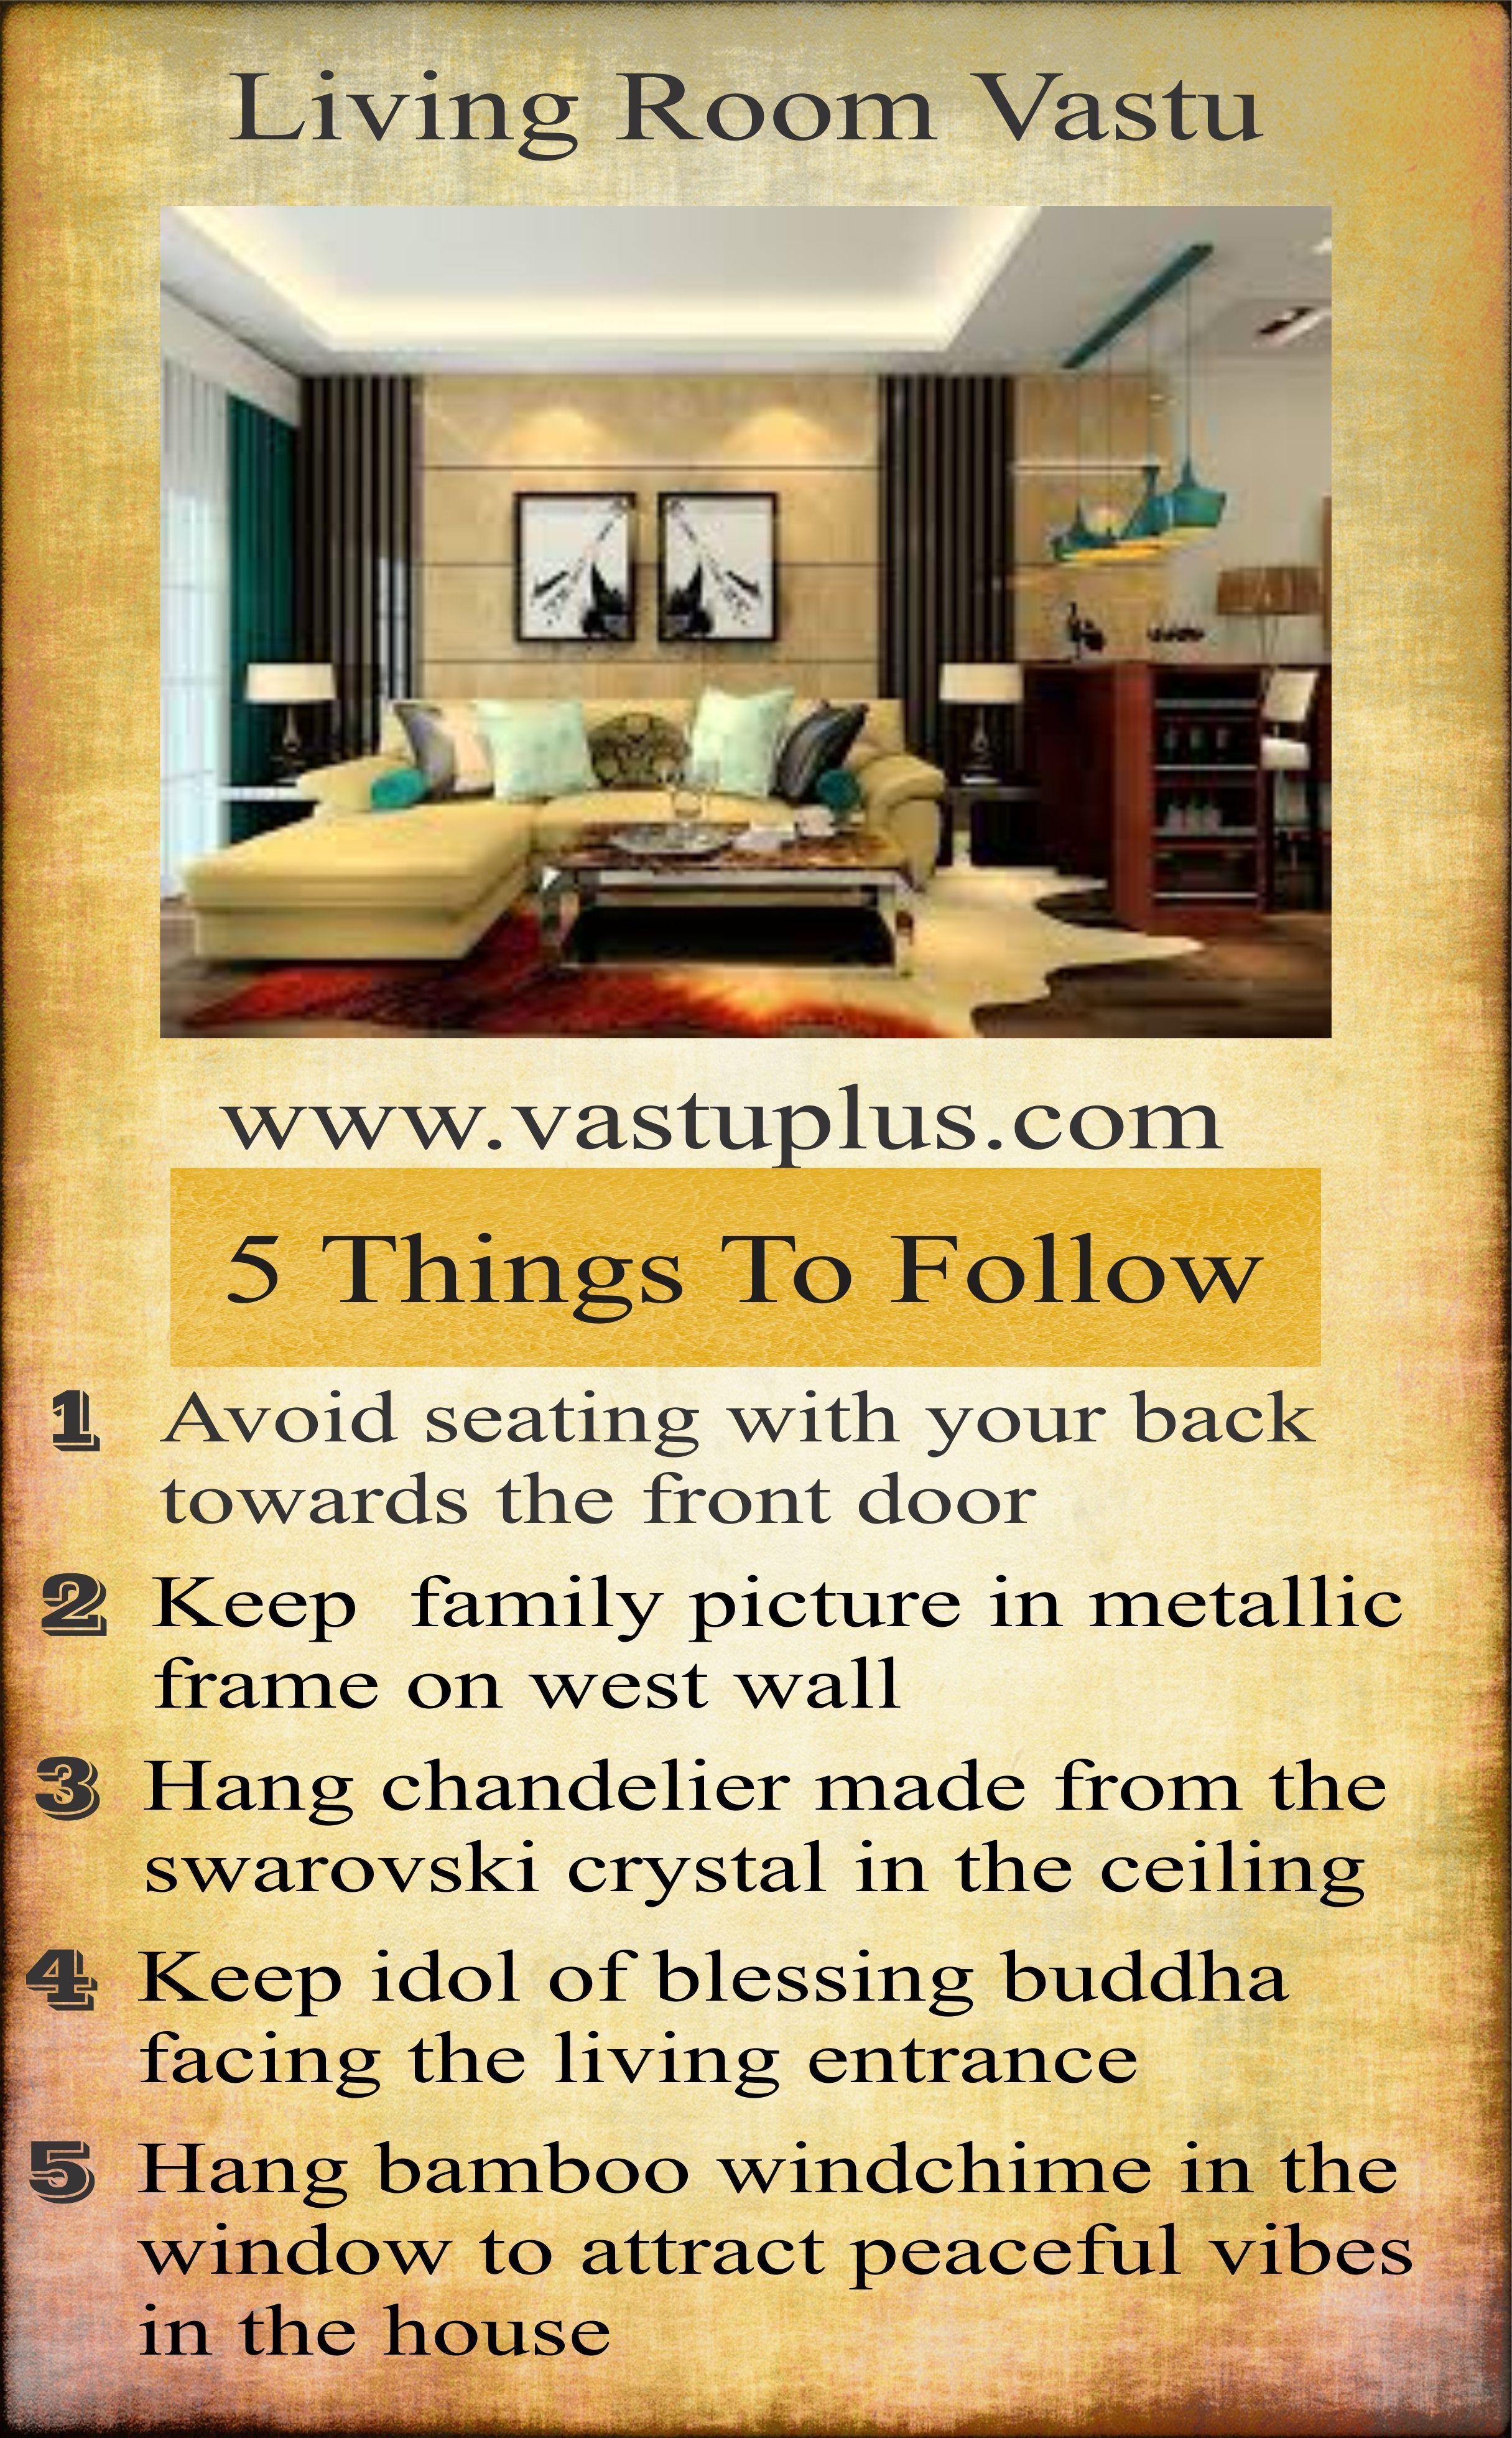 Vastu Shastra For Drawing Room In 2020 Vastu Shastra Vastu House Drawing Room Decor